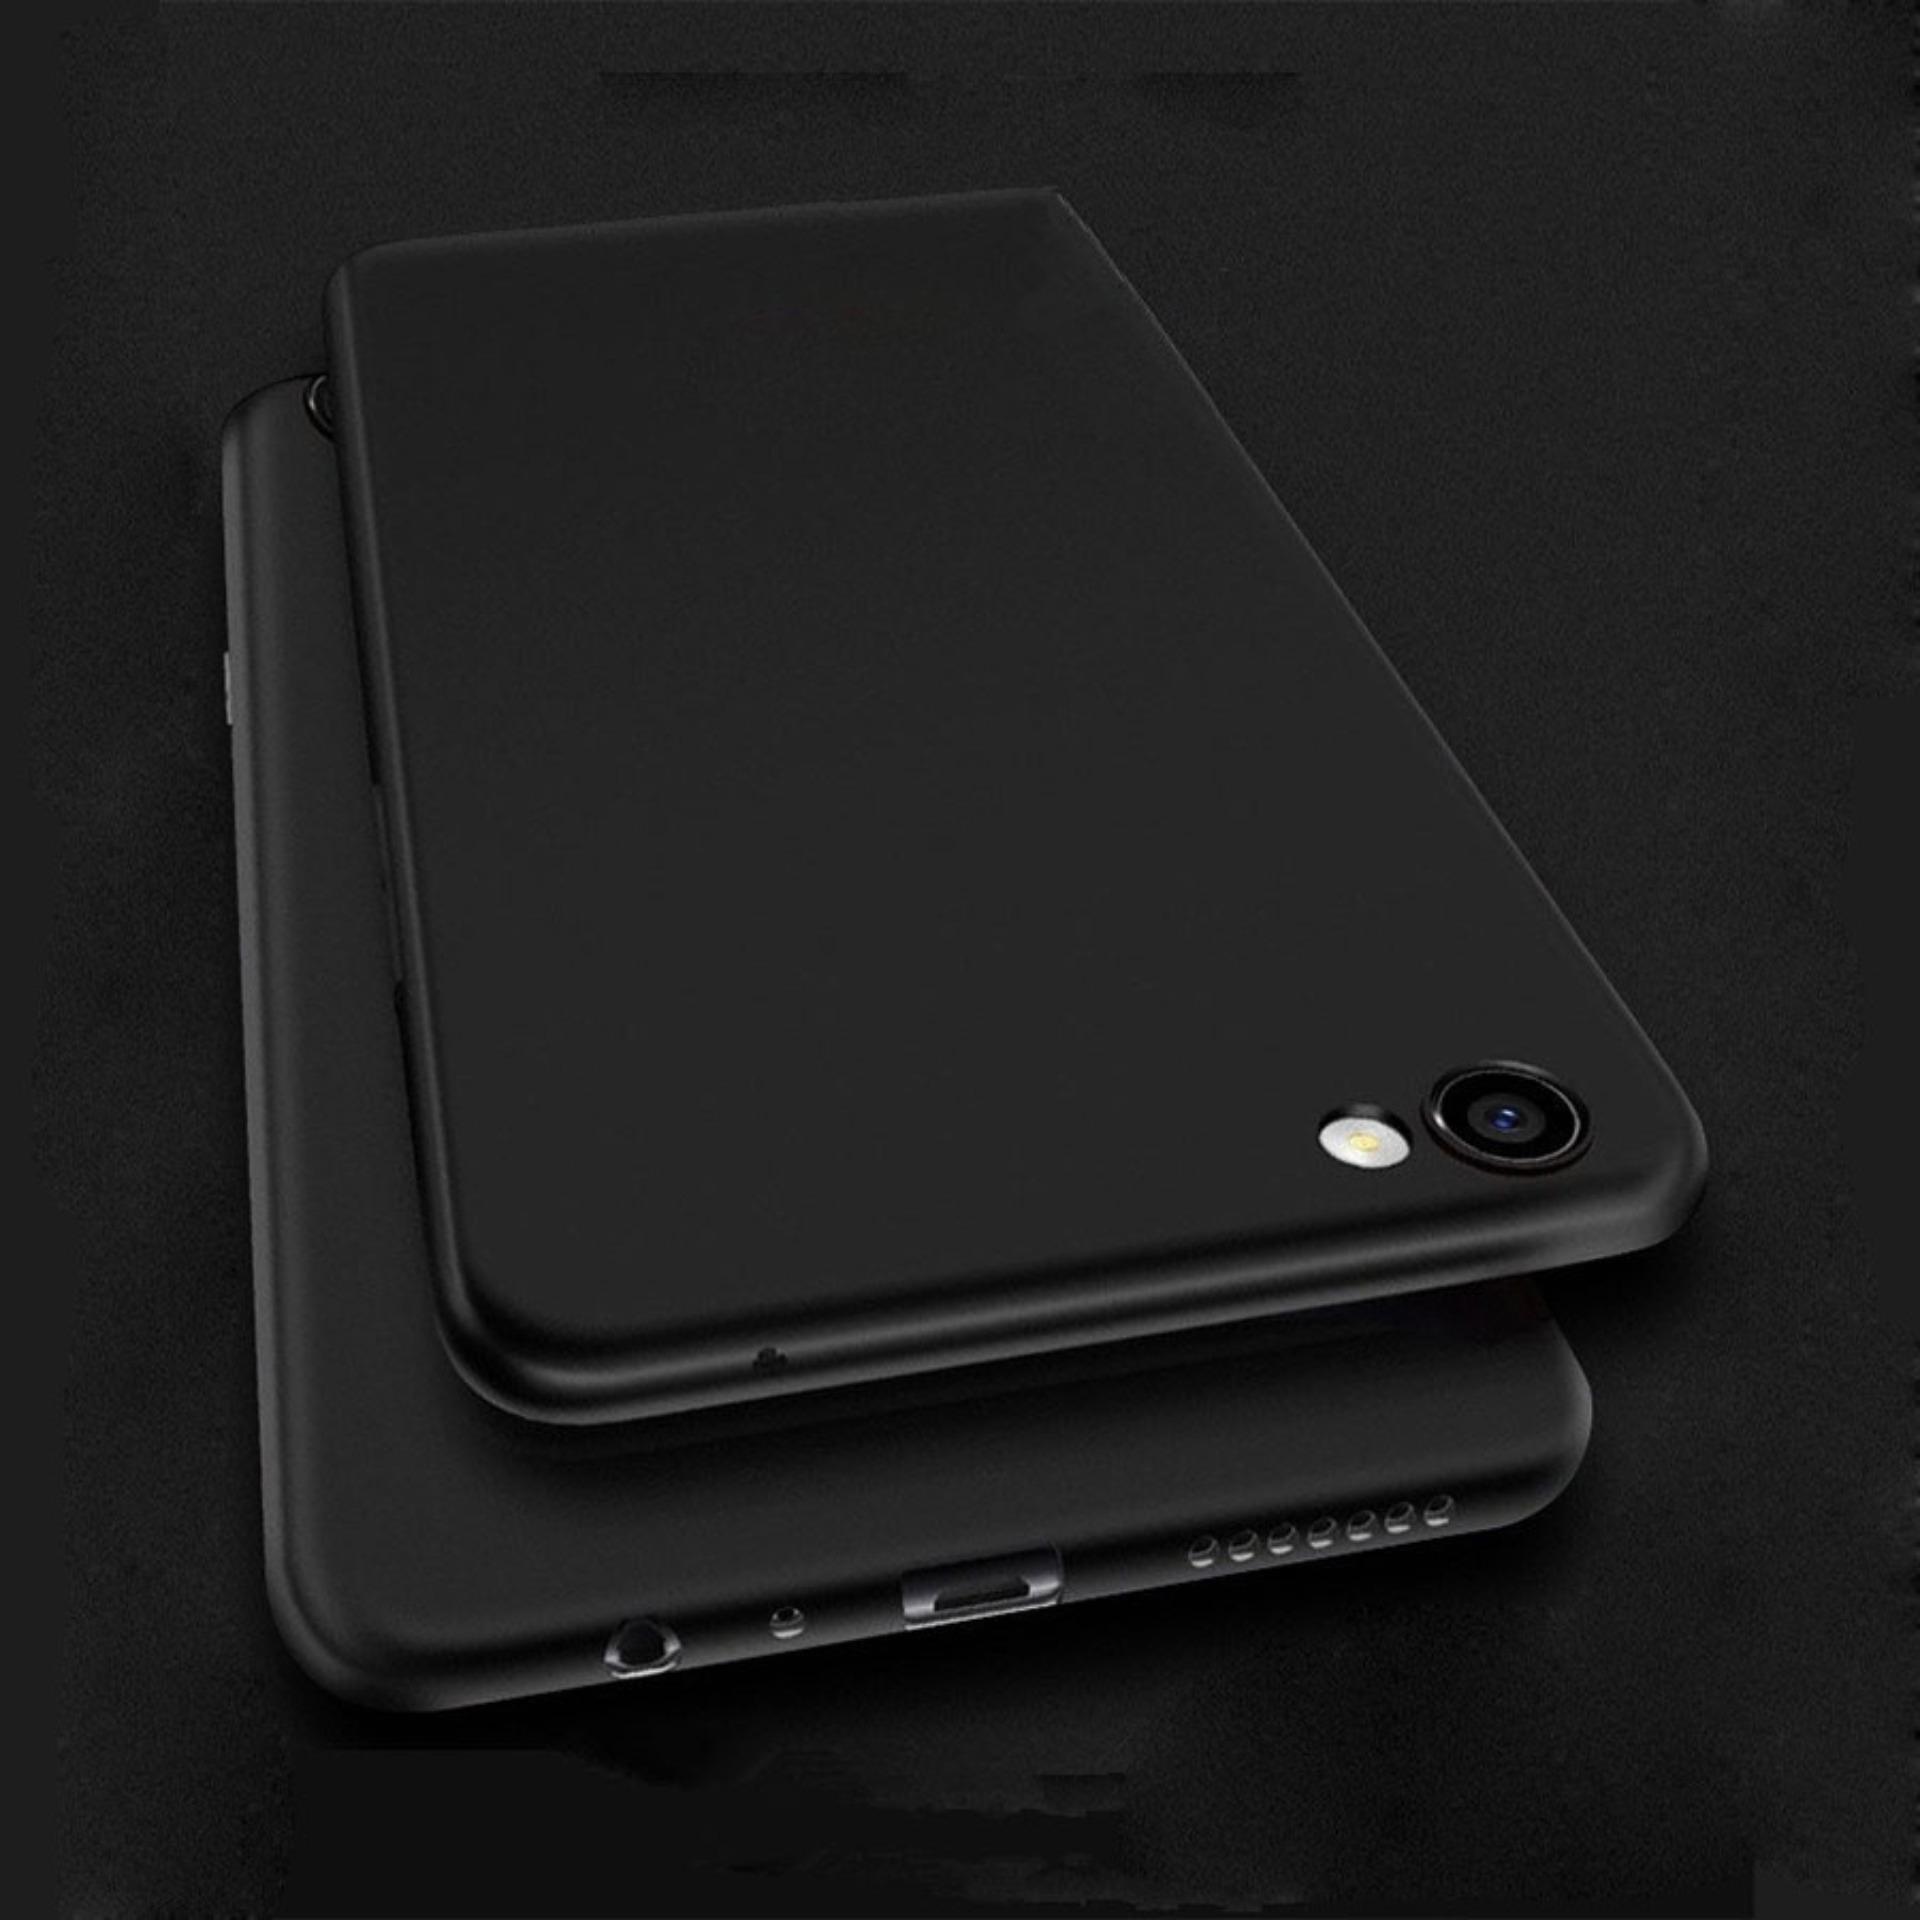 Case Slim Black Matte Oppo A71 Baby Skin Softcase Ultra Thin Jelly Silikon Babyskin/blak ...